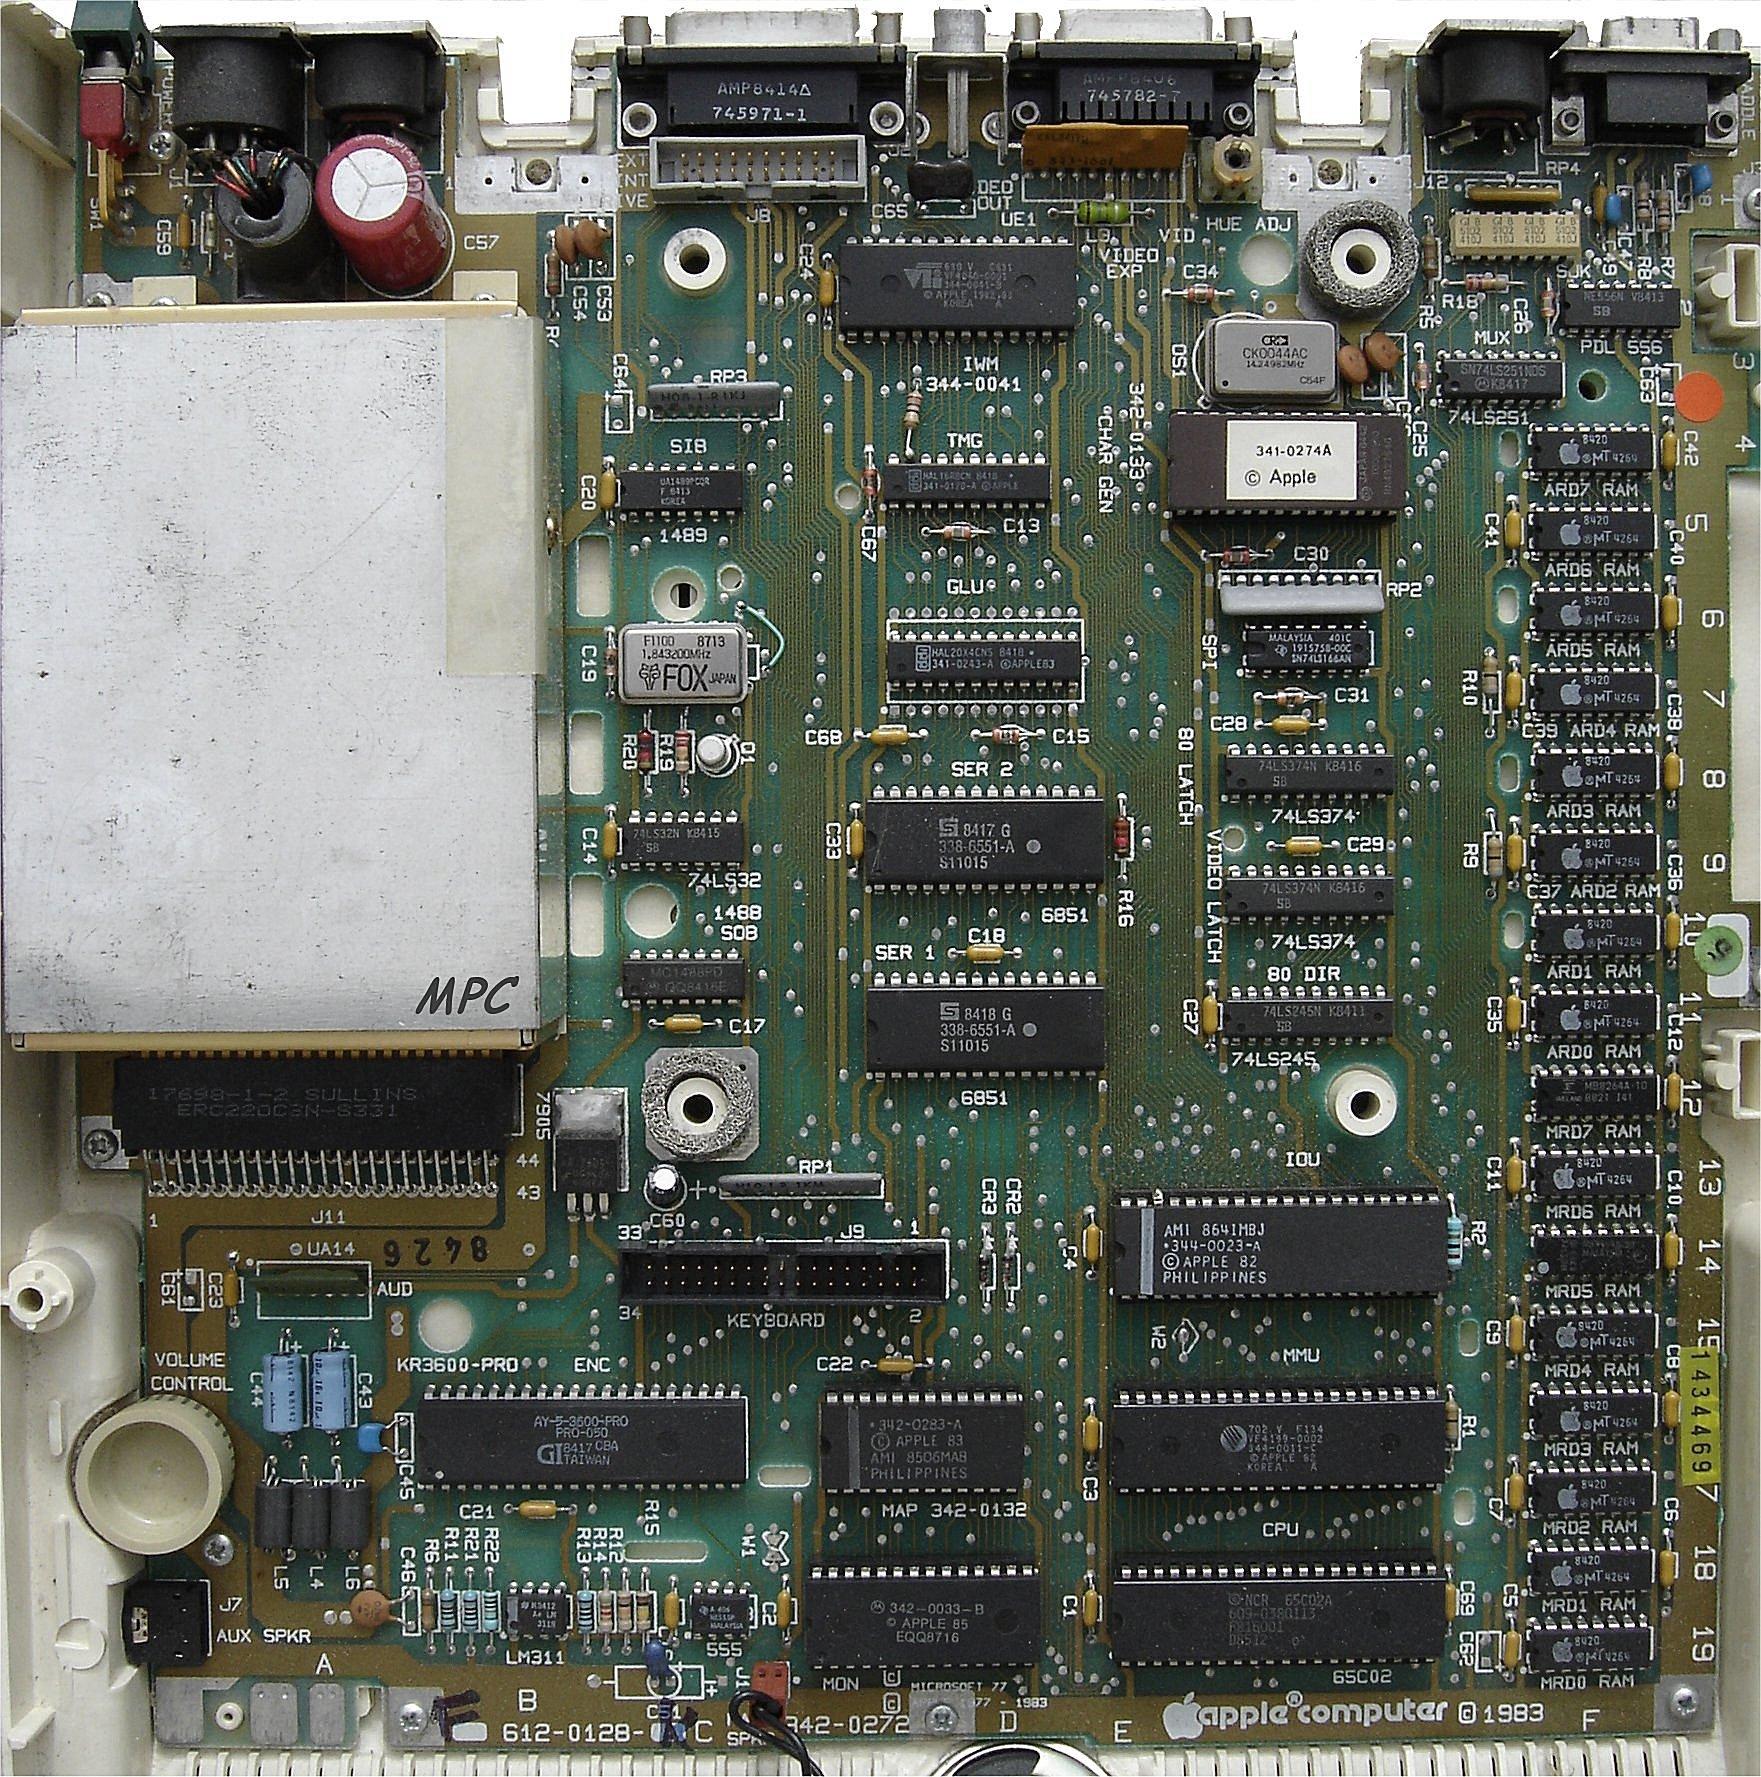 Sensors Active Components Dashing Co2 Carbon Dioxide Sensor Module Mg811 Voltage Type 0-2v Voltage Output